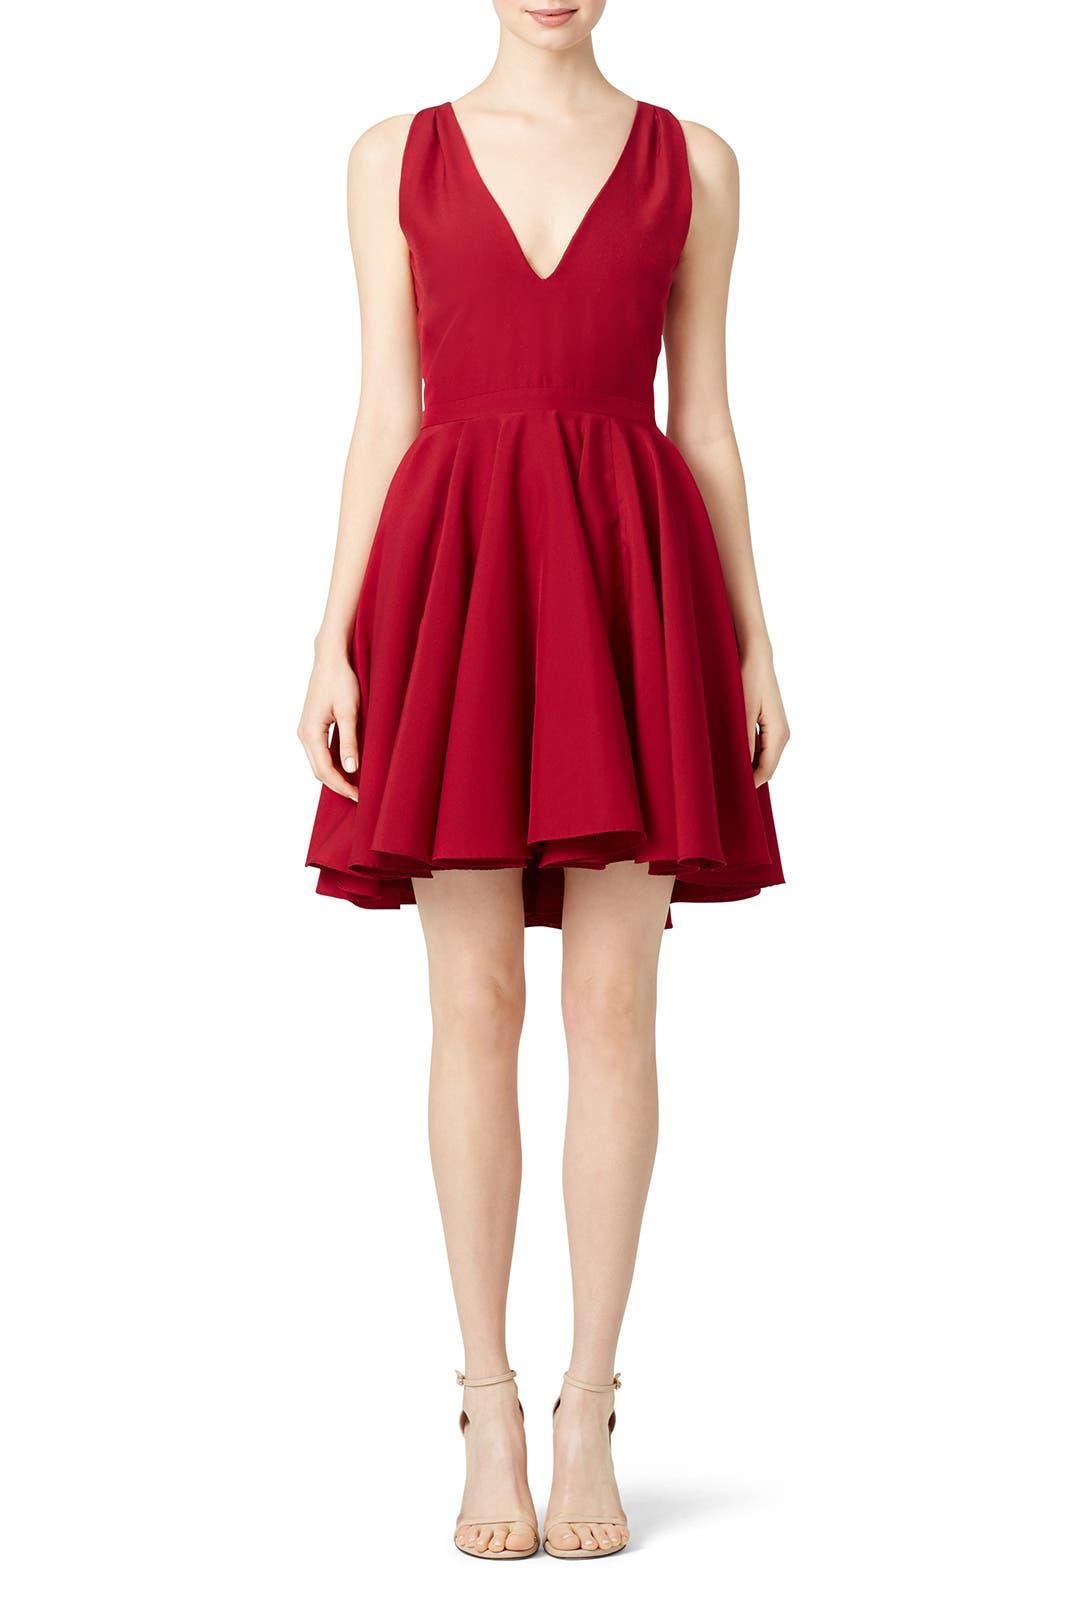 Down the Middle Dress by allison parris